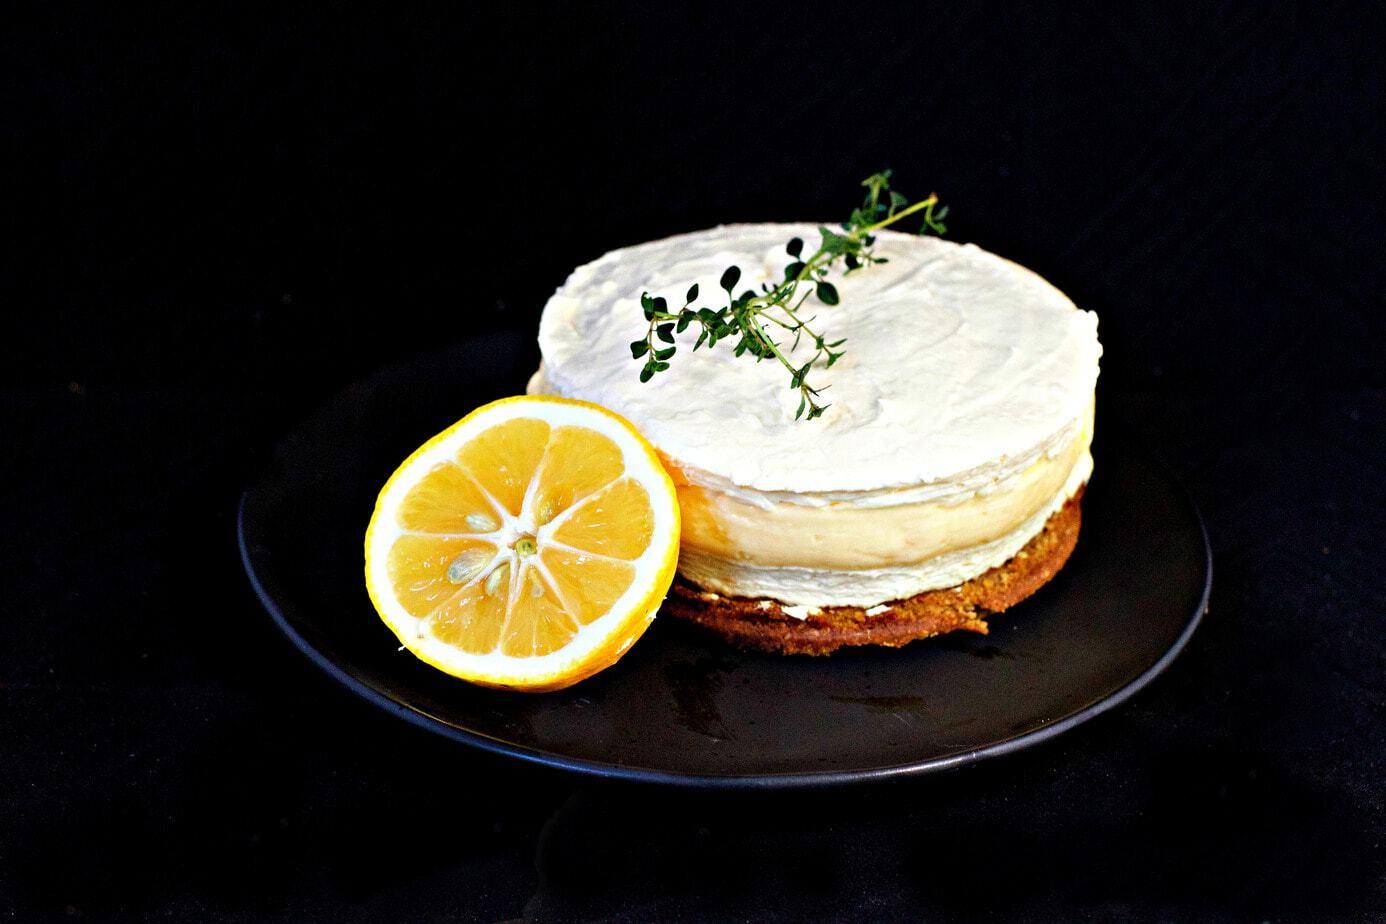 Mad Creations Lemon Curd Keto Cheesecake